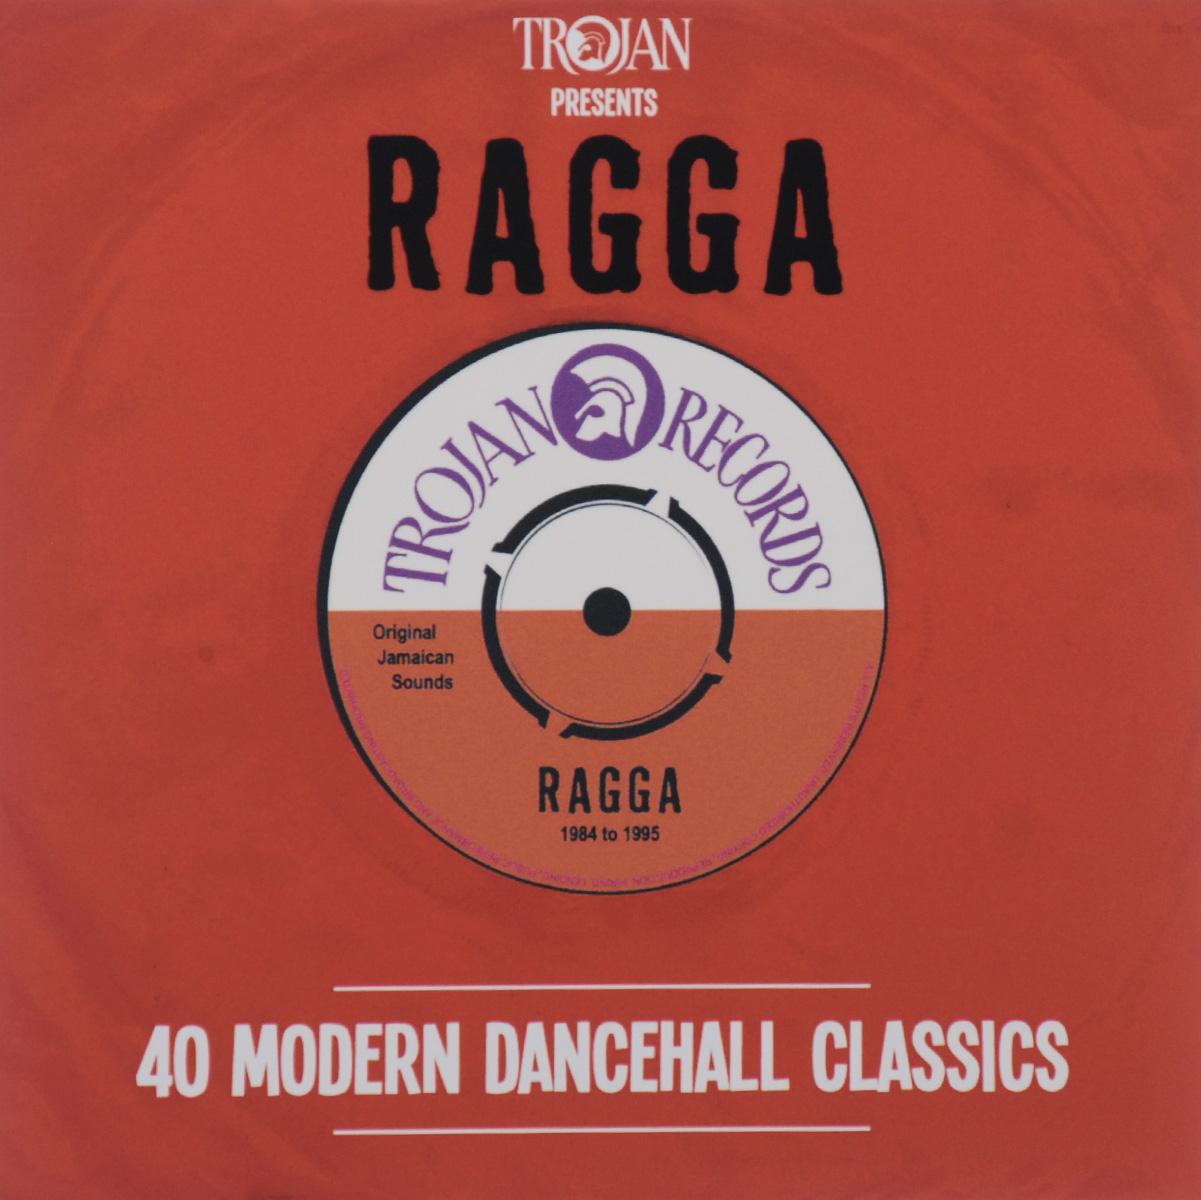 Ragga. 40 Modern Dancehall Classics (2 CD)